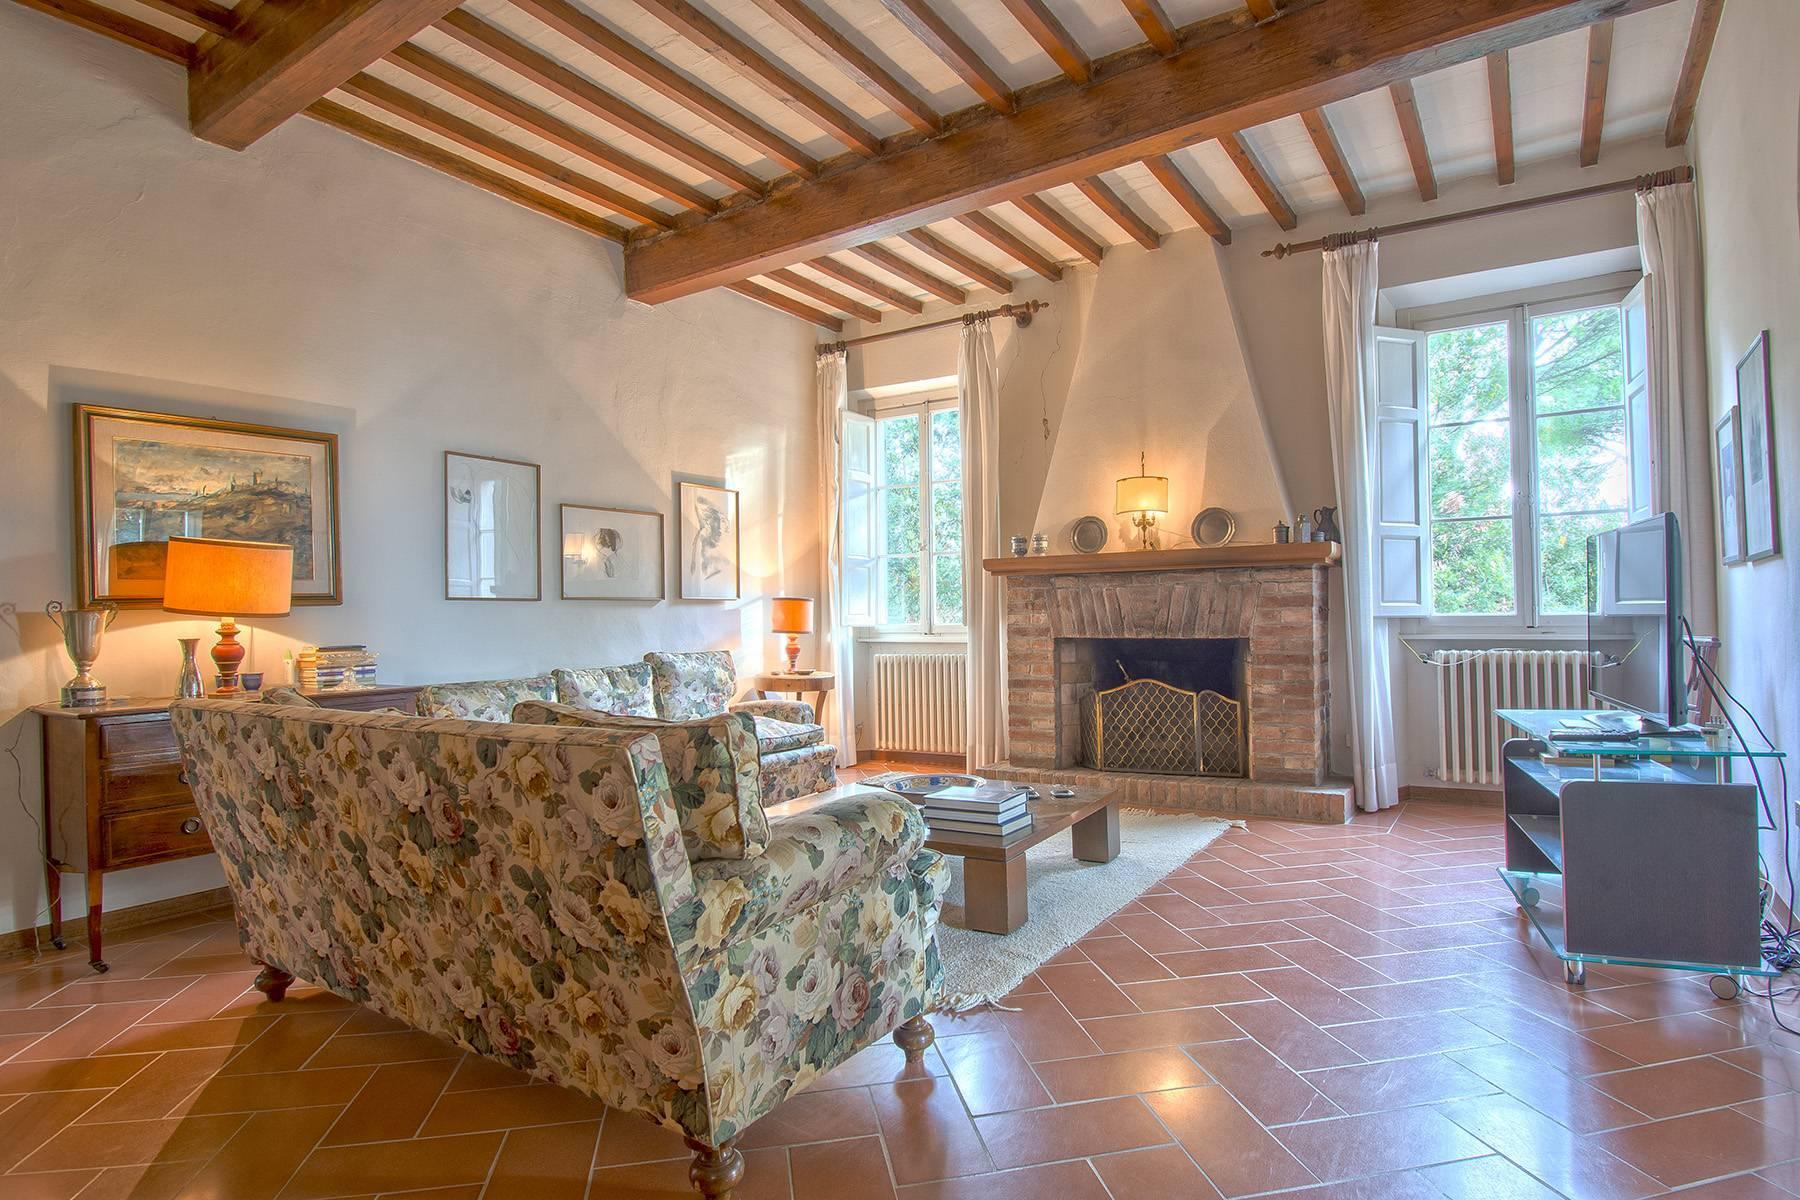 Winery with Historic Villa in San Miniato, Pisa - 8